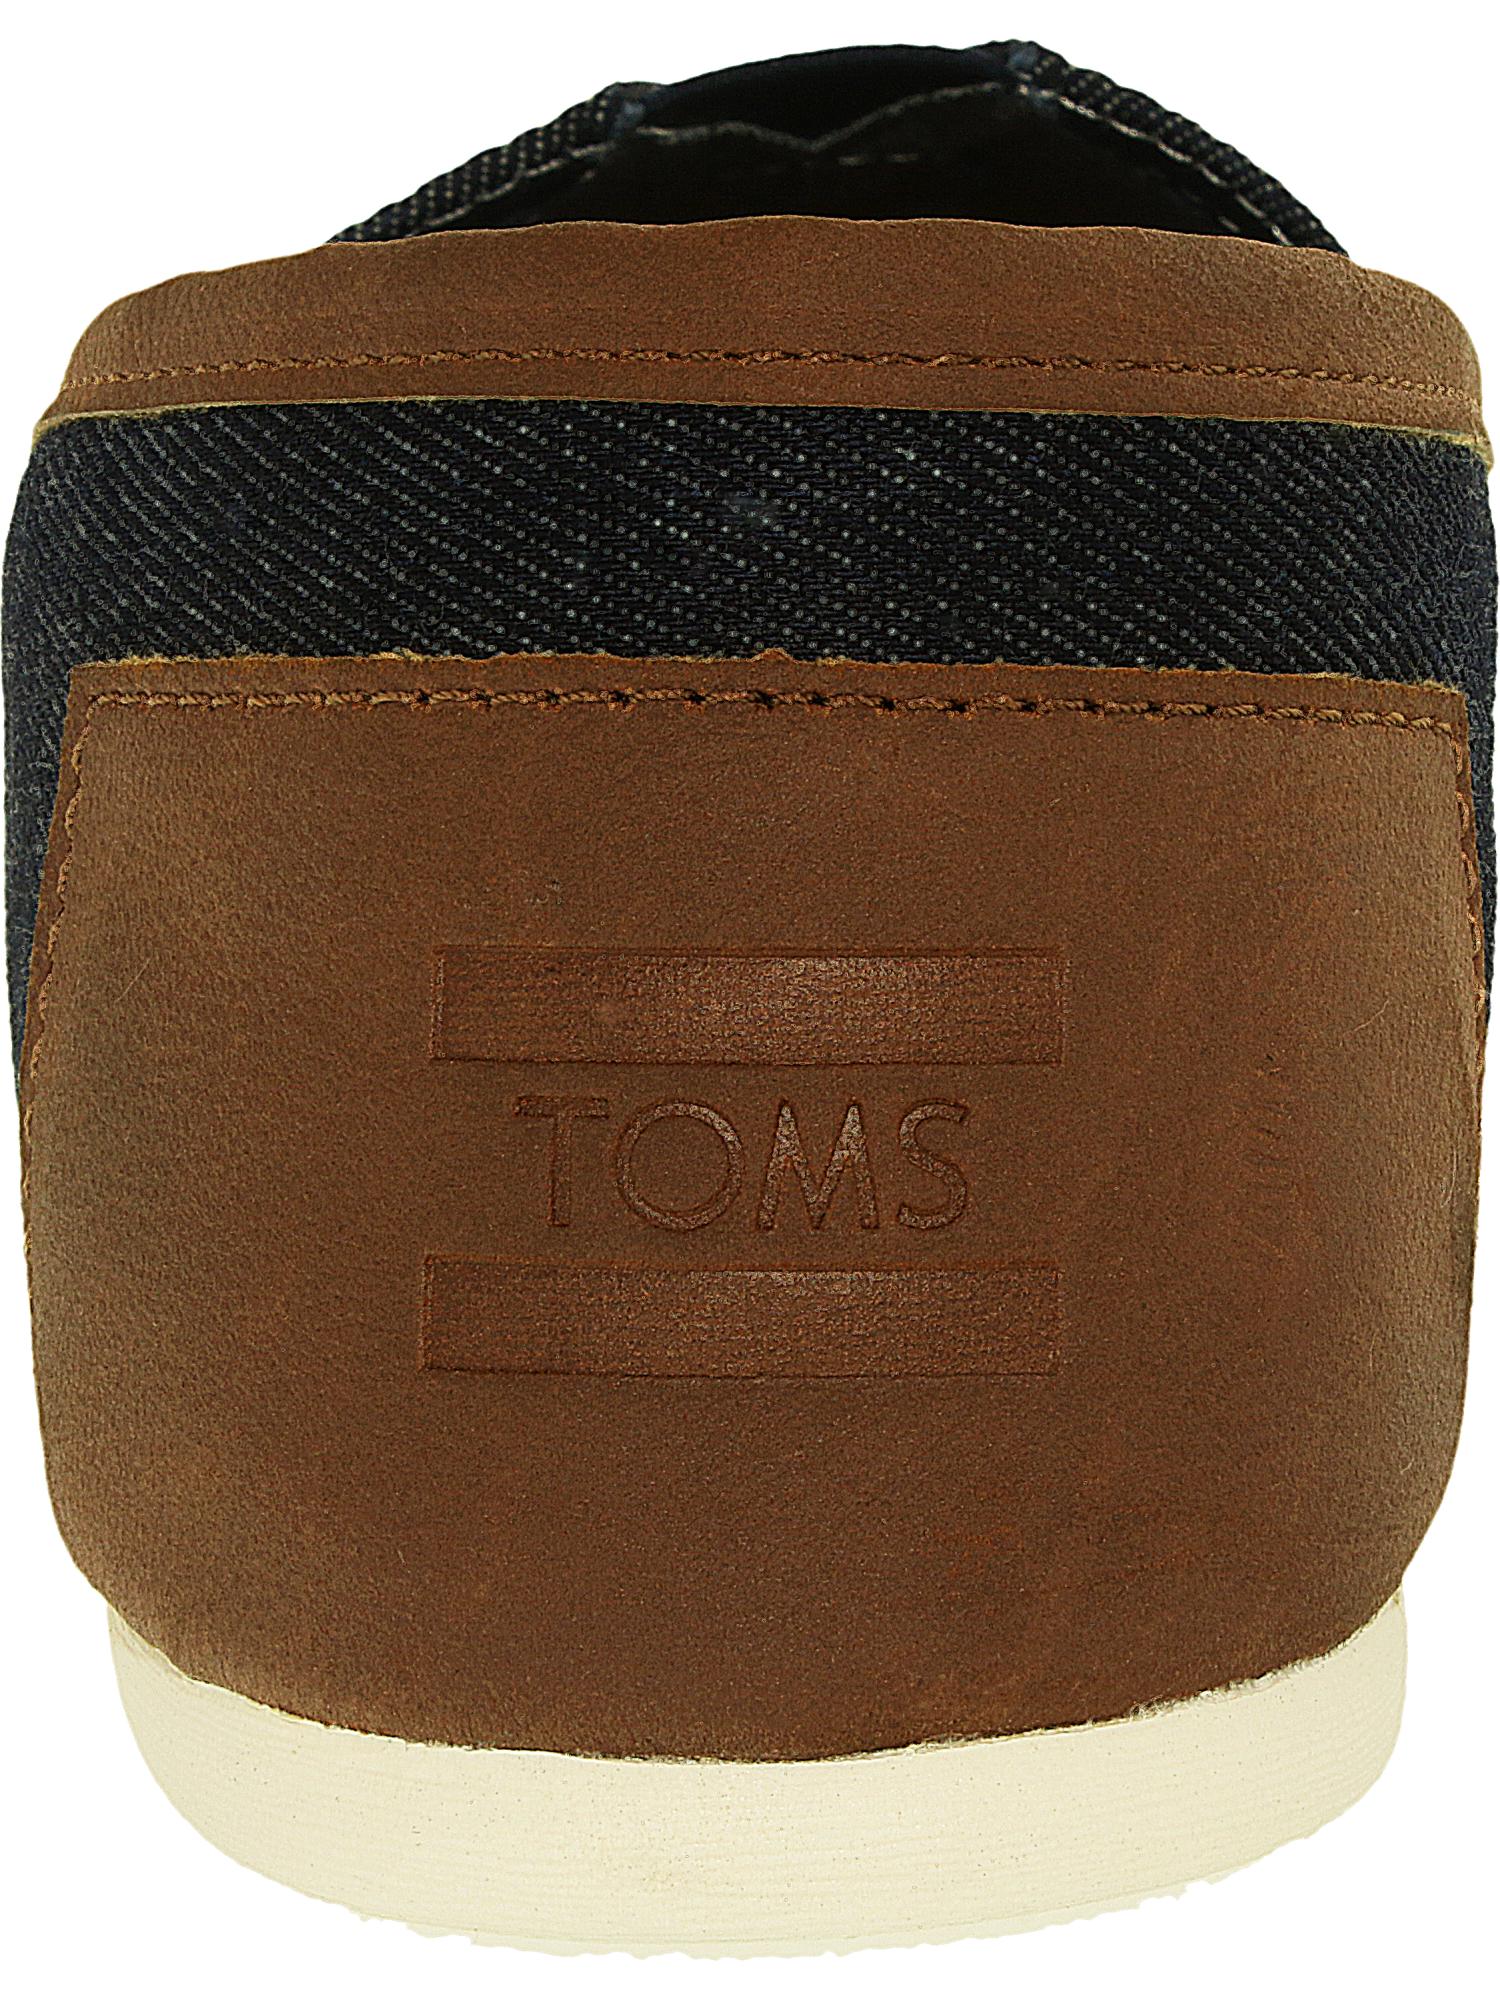 Toms-Men-039-s-Classic-Denim-Ankle-High-Canvas-Slip-On-Shoes thumbnail 6